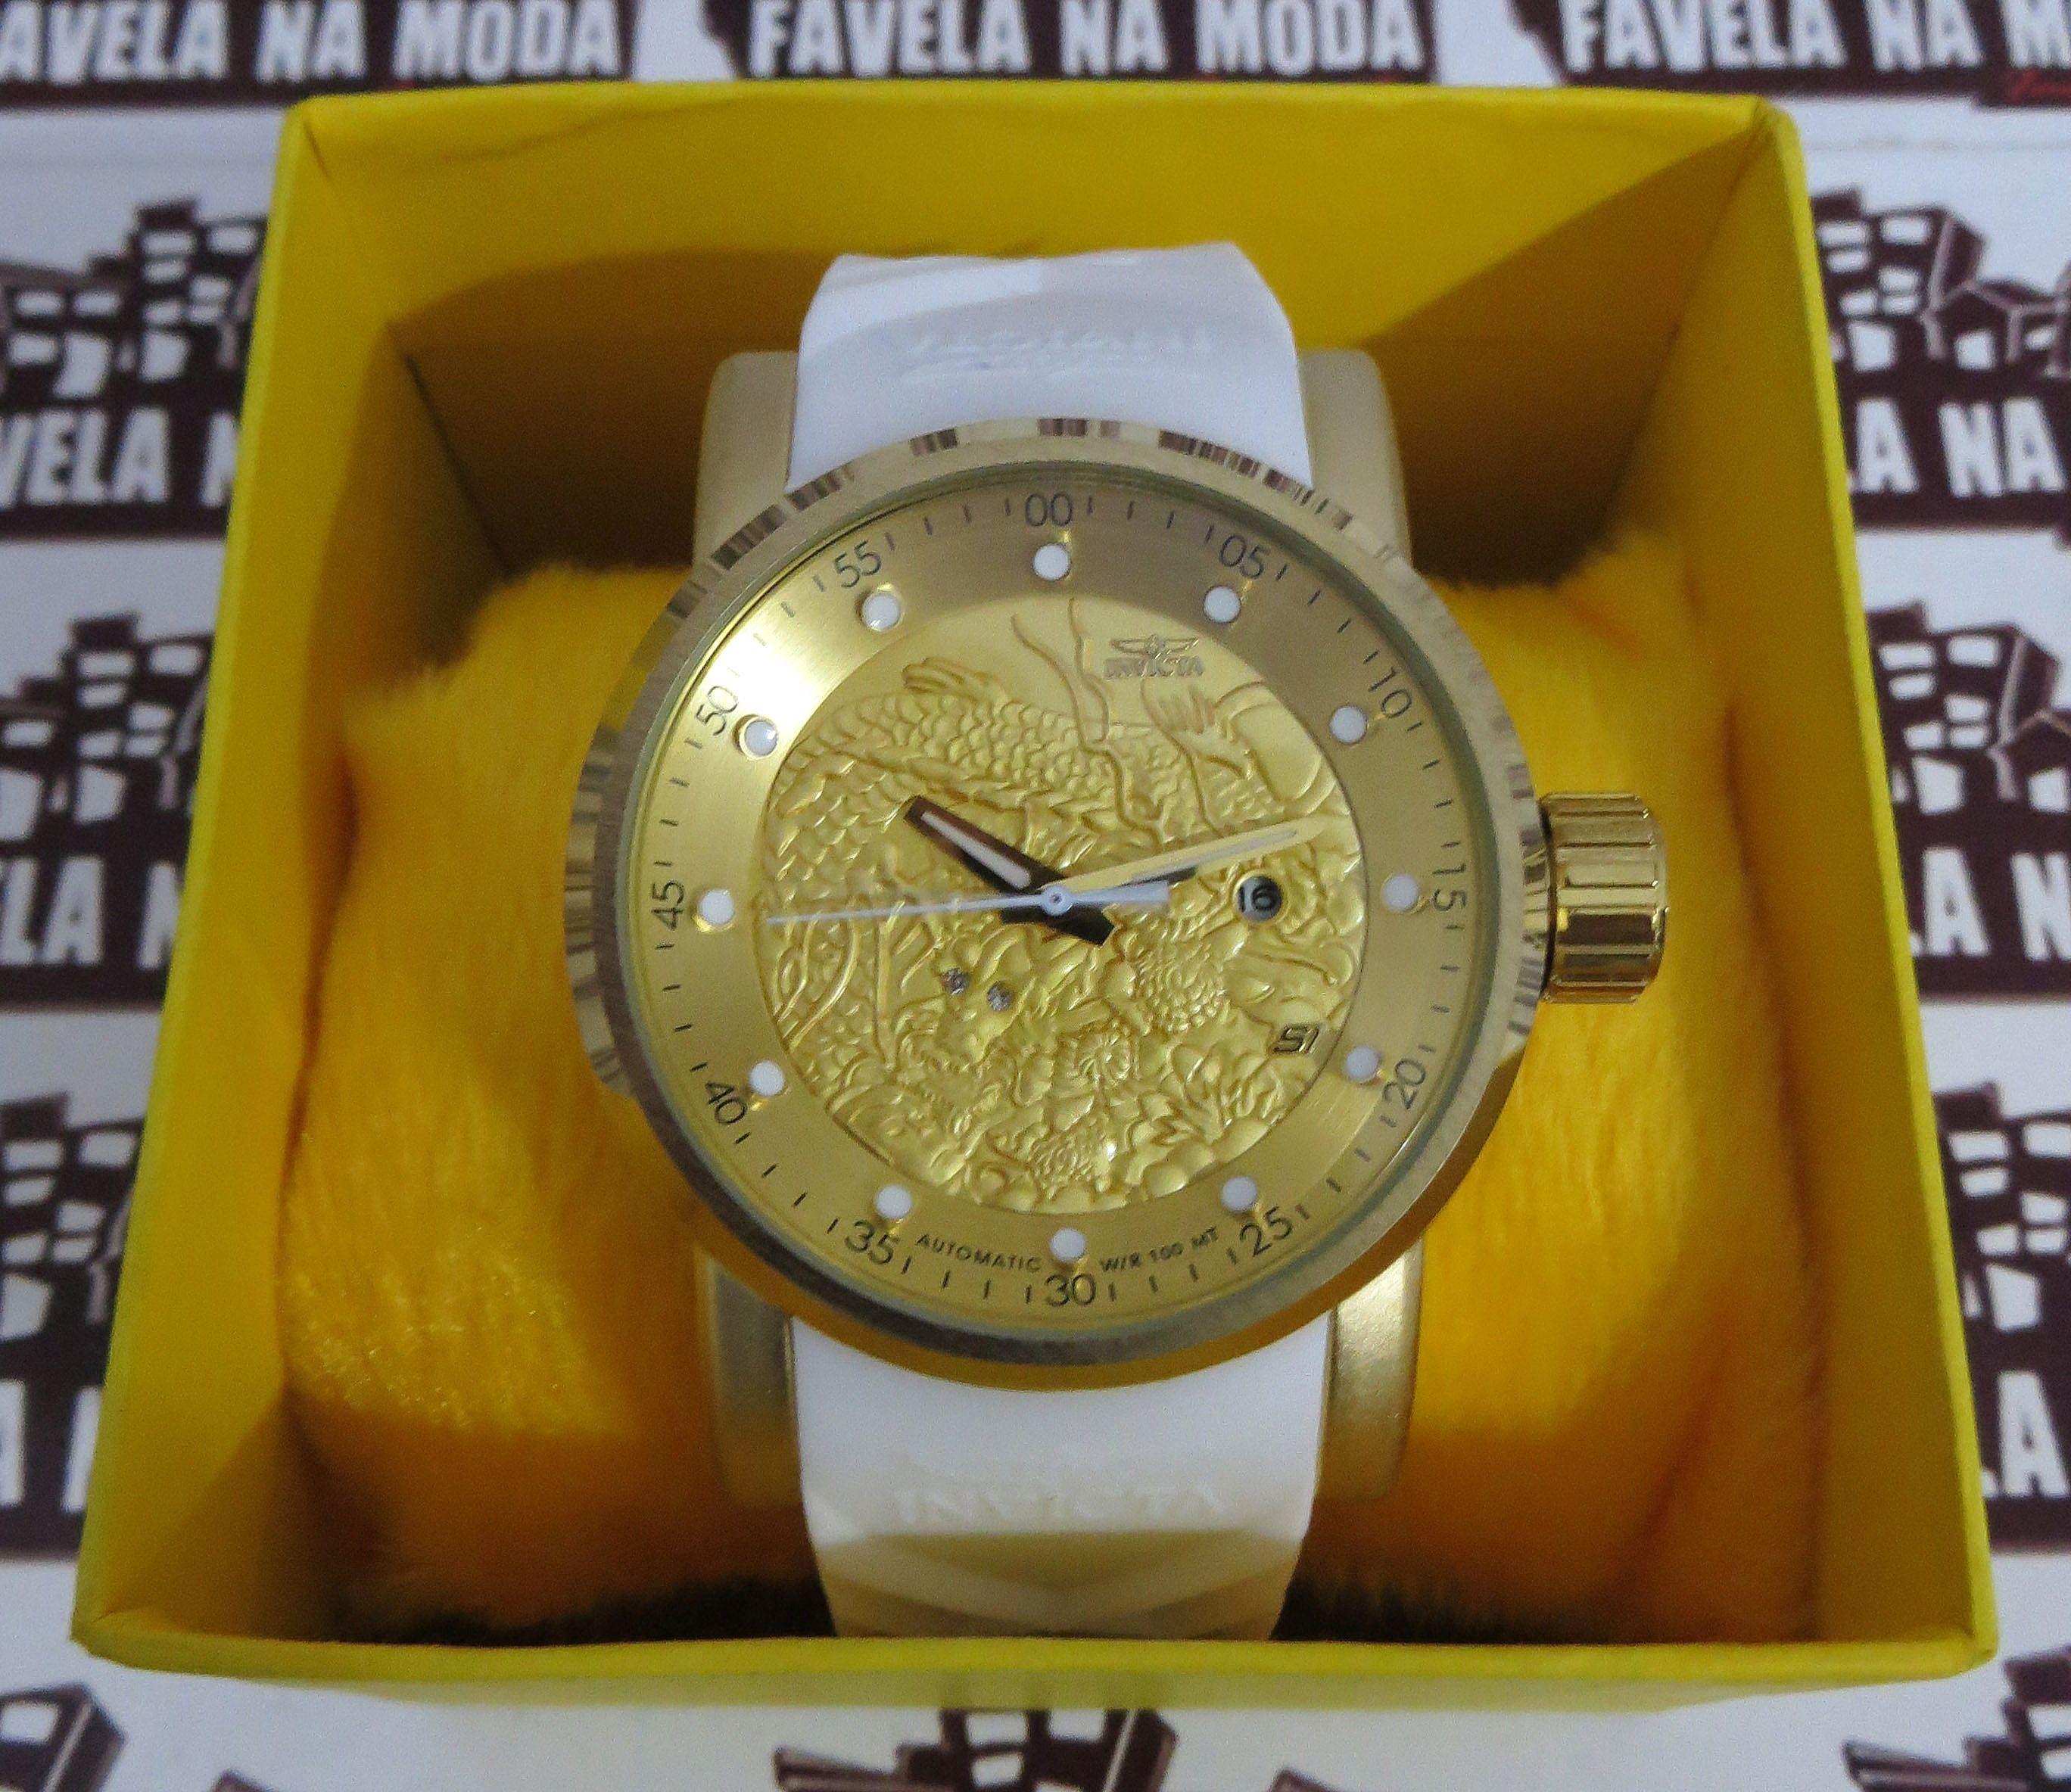 cc2f8aa1185 Relógio Invicta Yakuza Dragon S1- Branco   Dourado